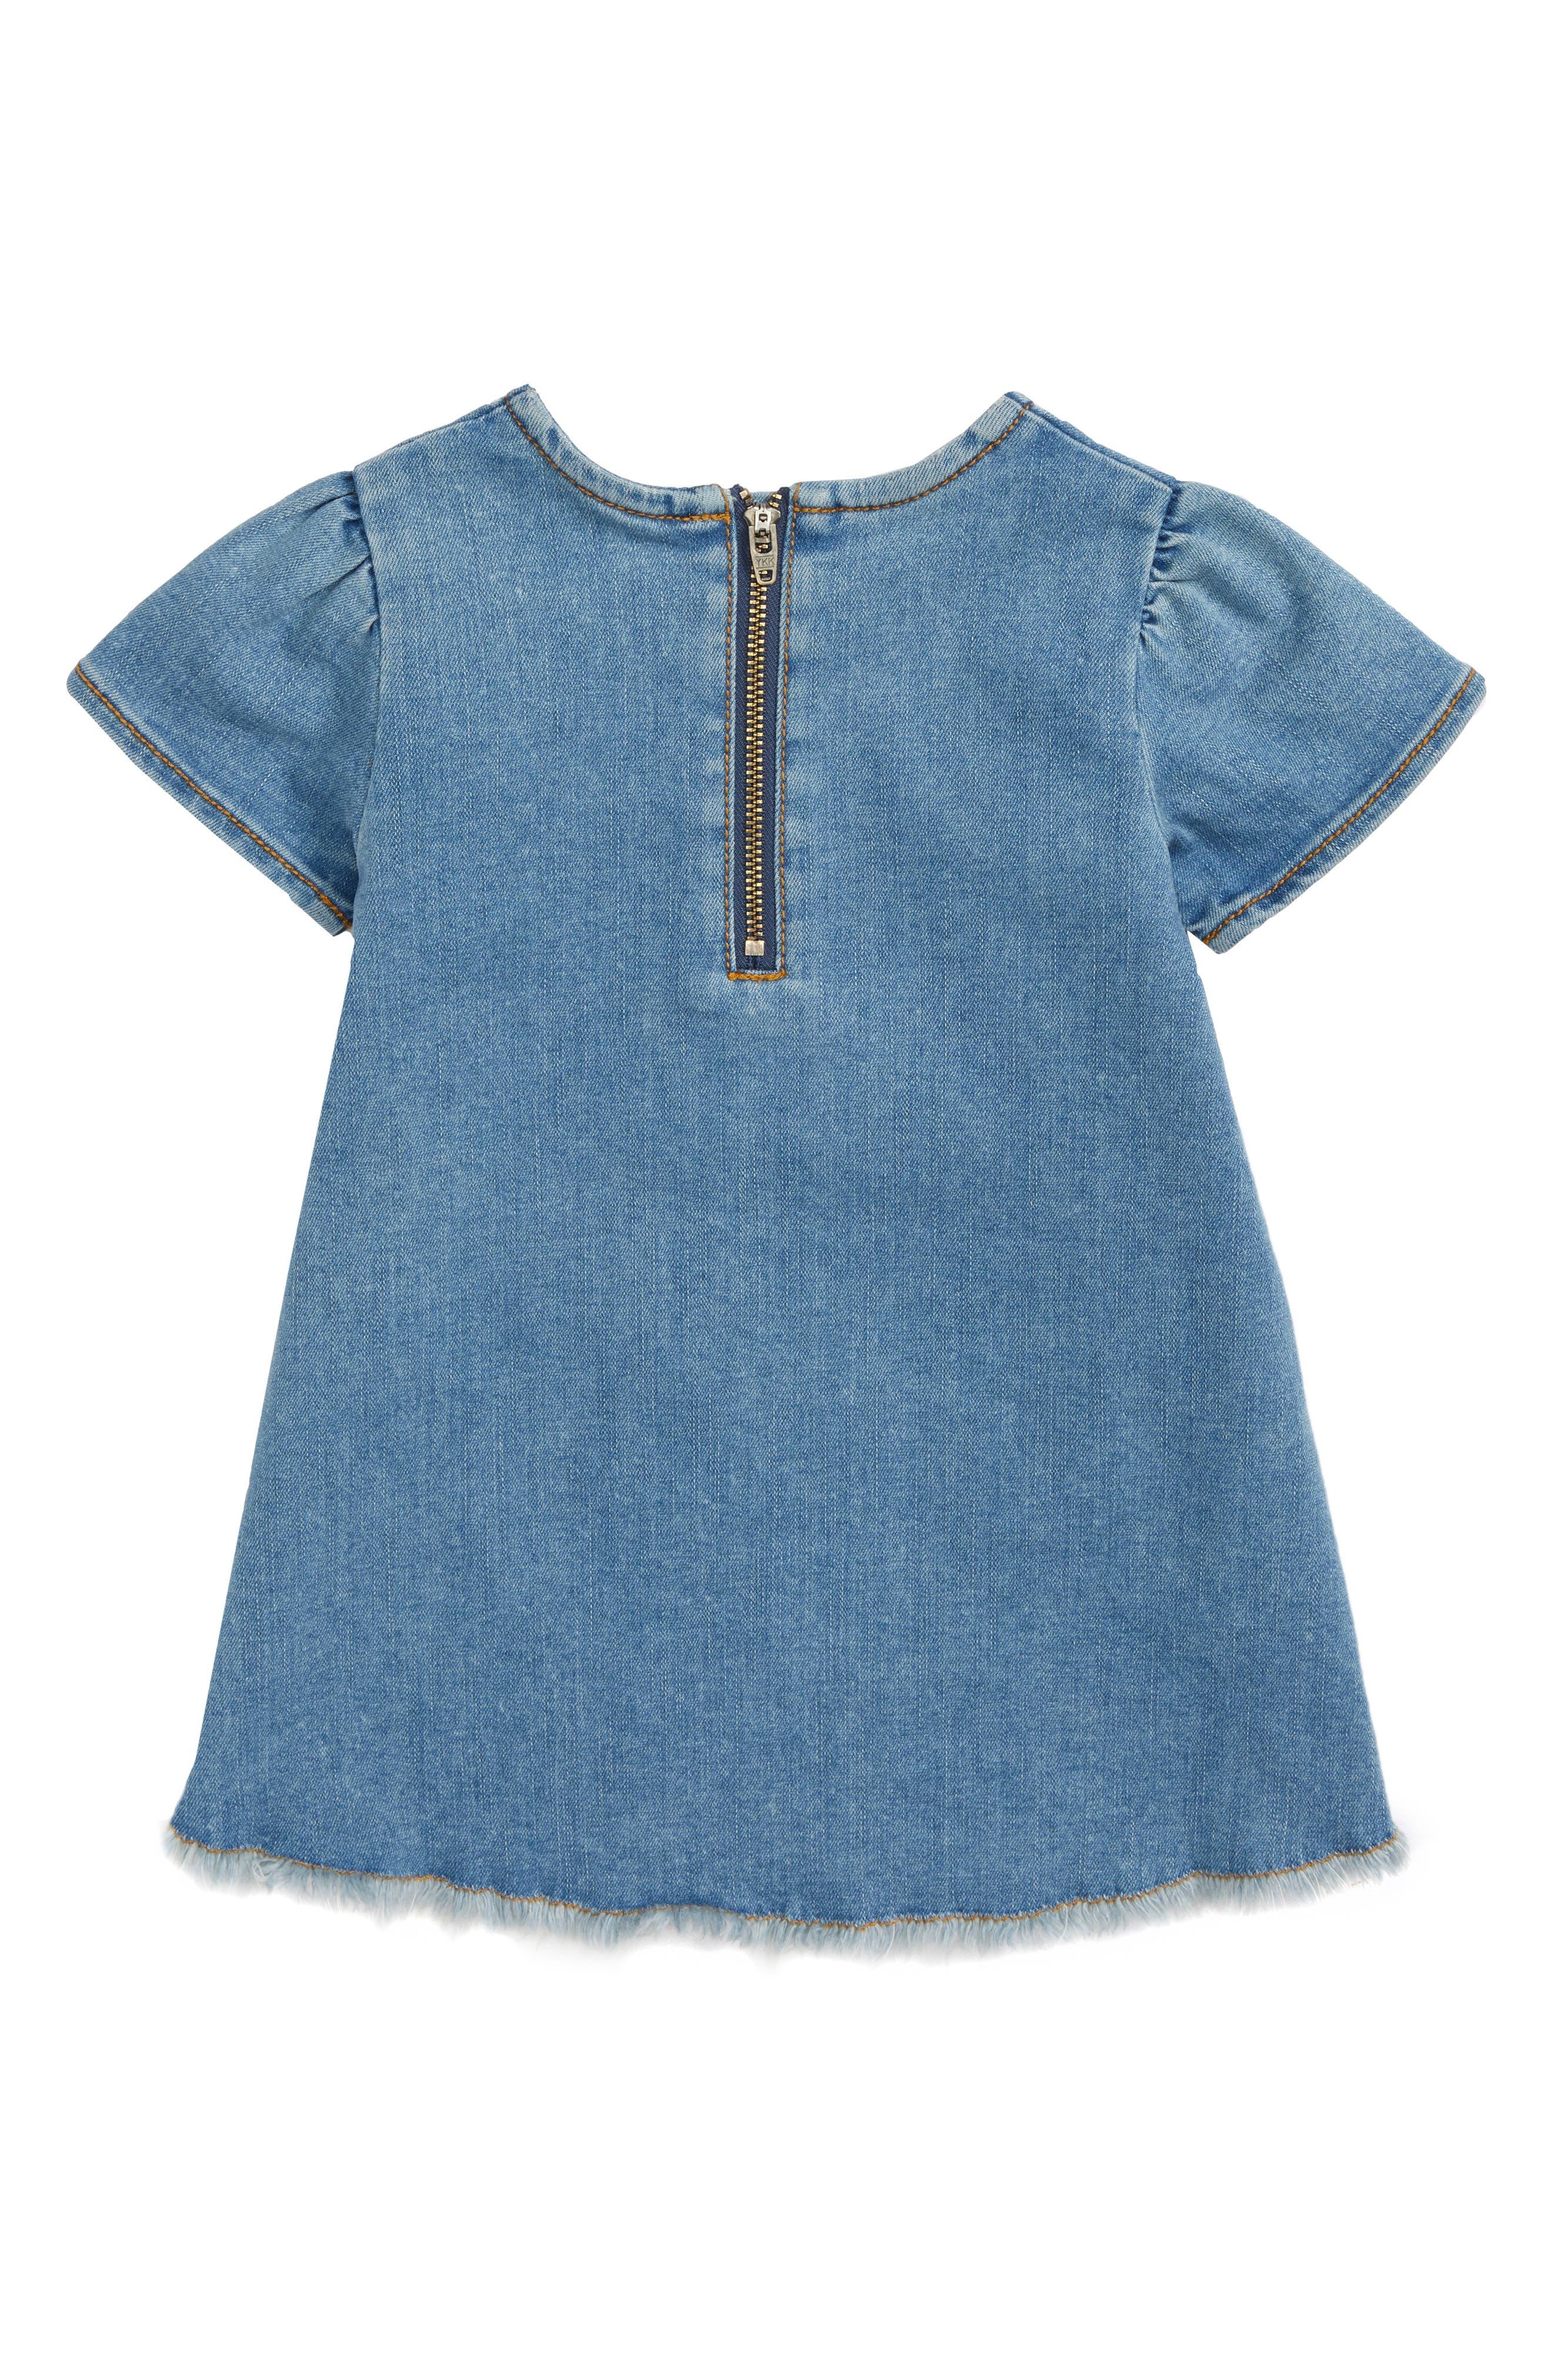 Embroidered Denim Dress,                             Alternate thumbnail 2, color,                             420